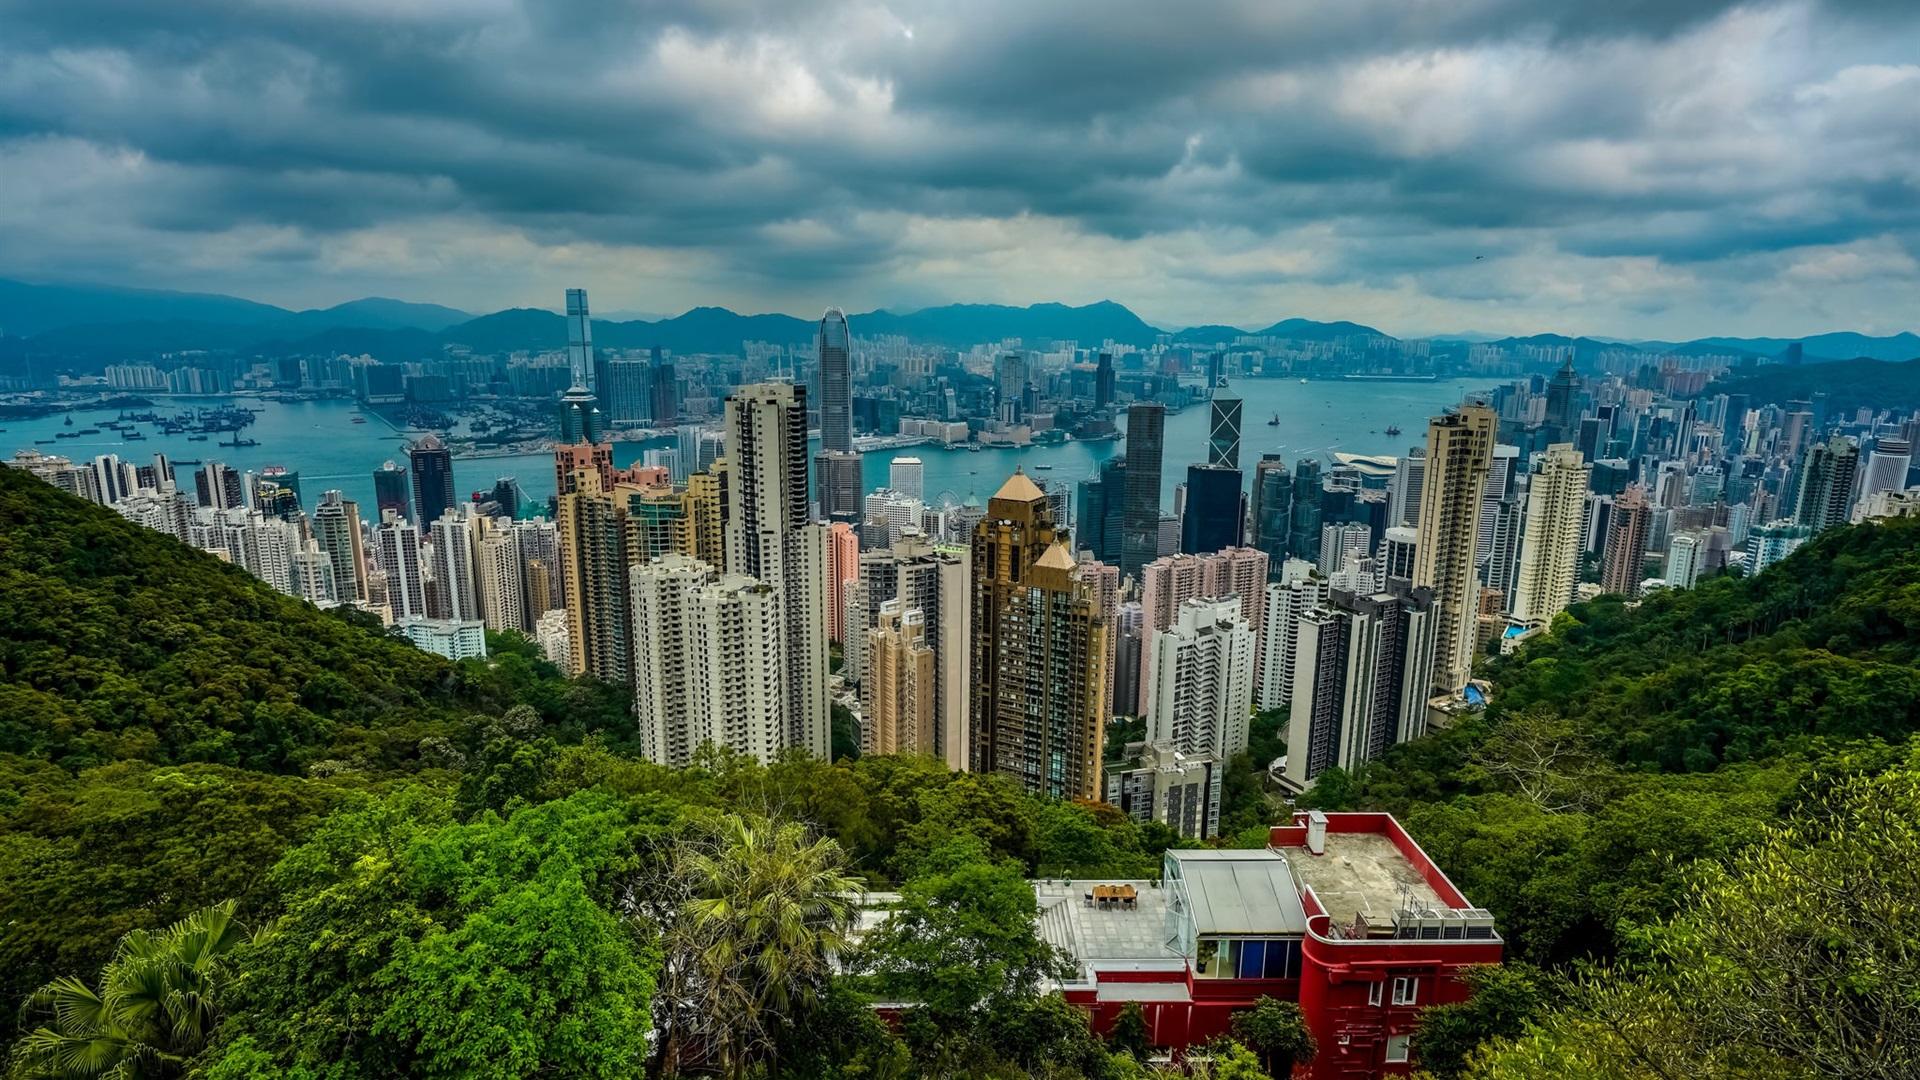 Hong Kong City View From Mountain Top Views 750x1334 Iphone 8 7